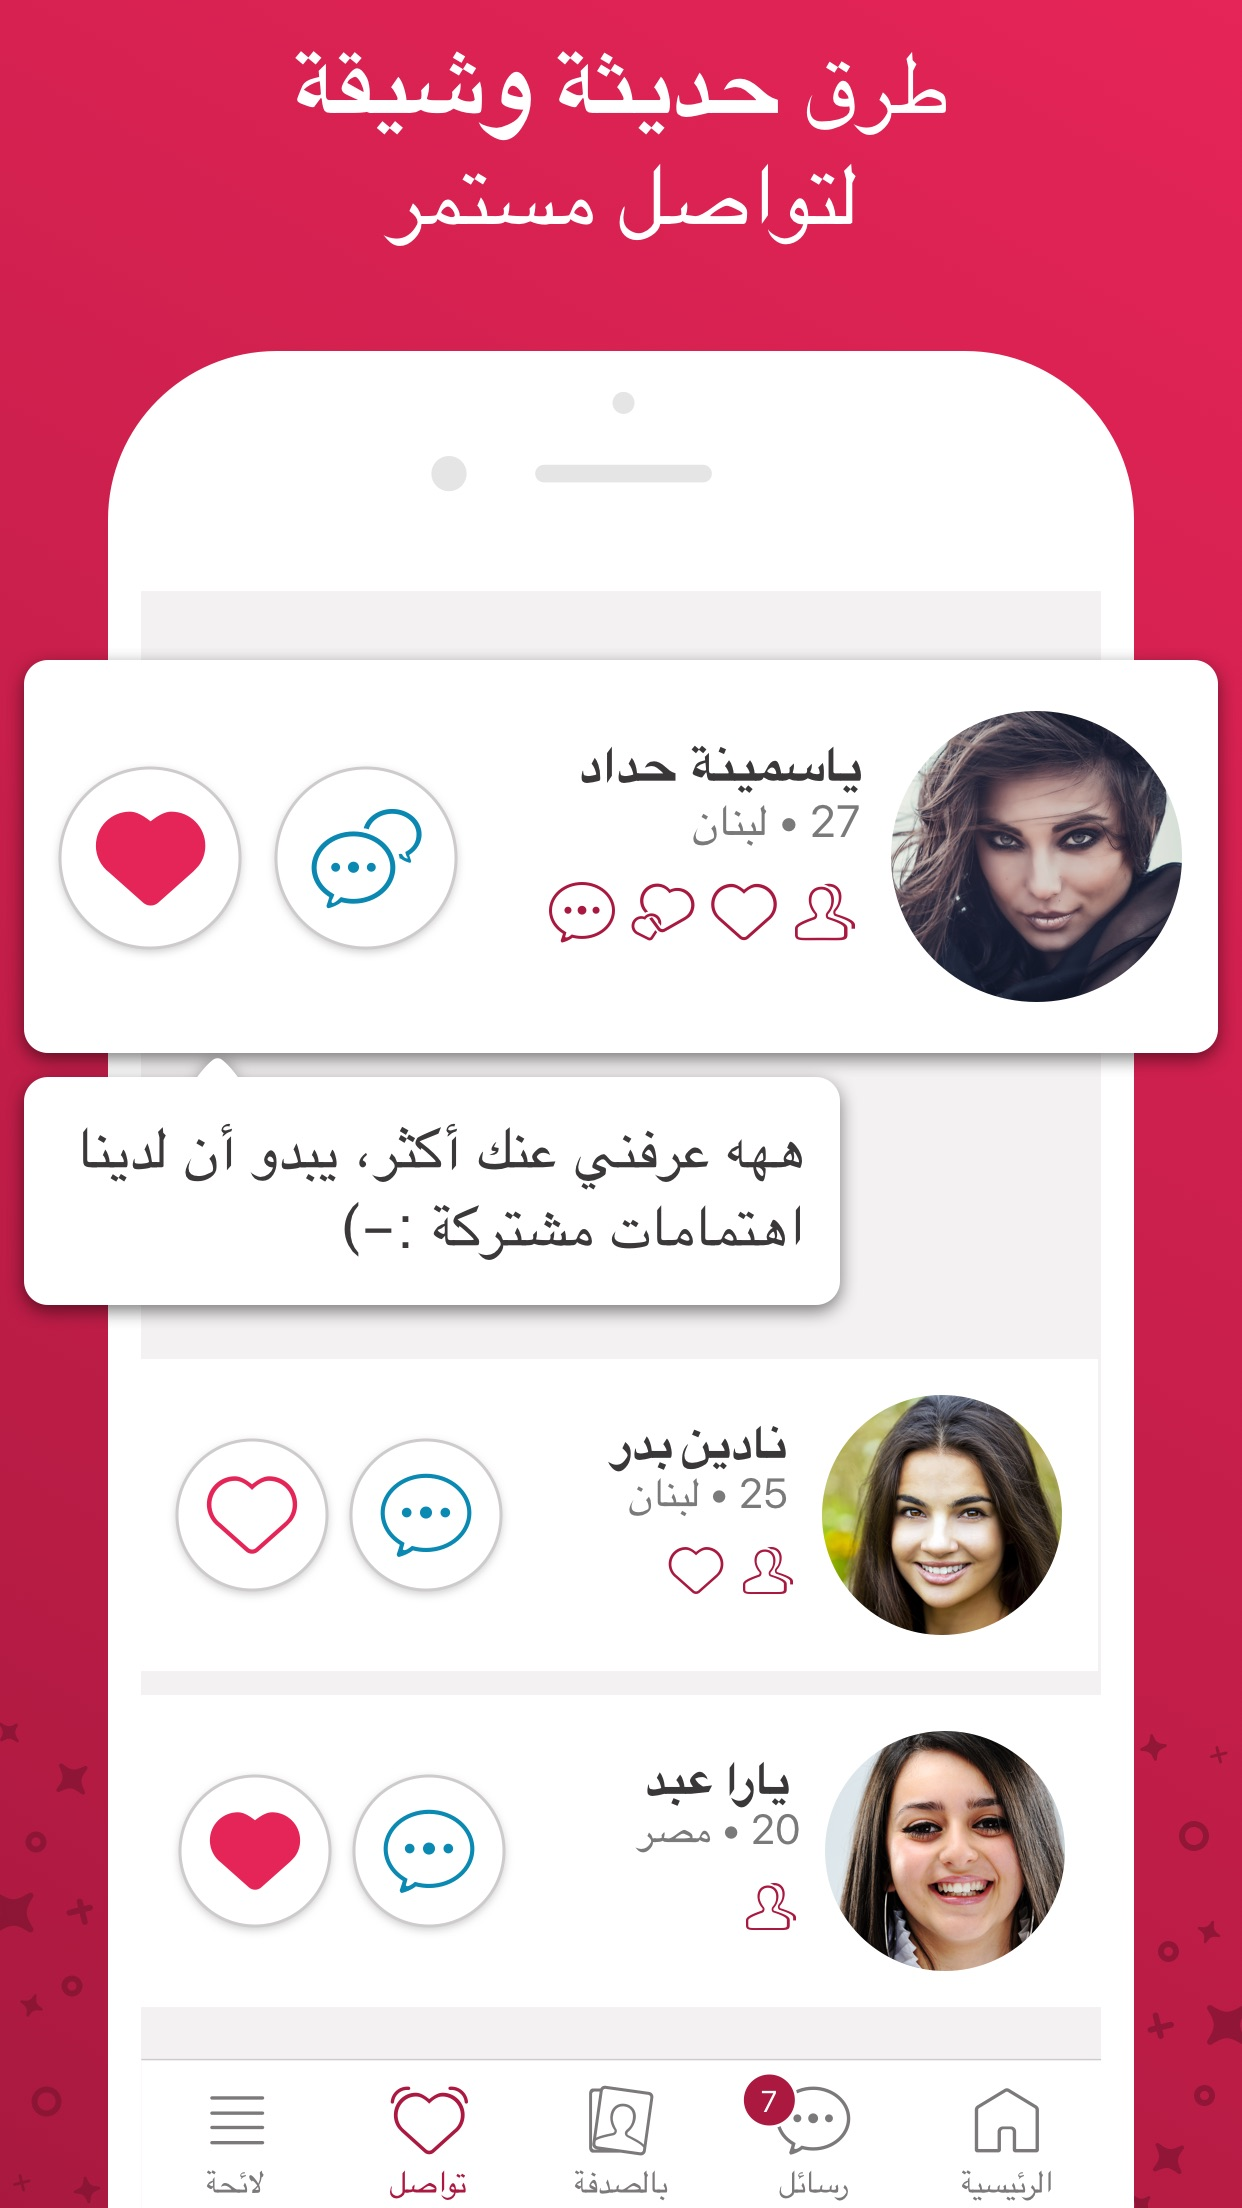 Soudfa - Love & Zawaj * صدفة - تعارف دردشة وزواج Screenshot